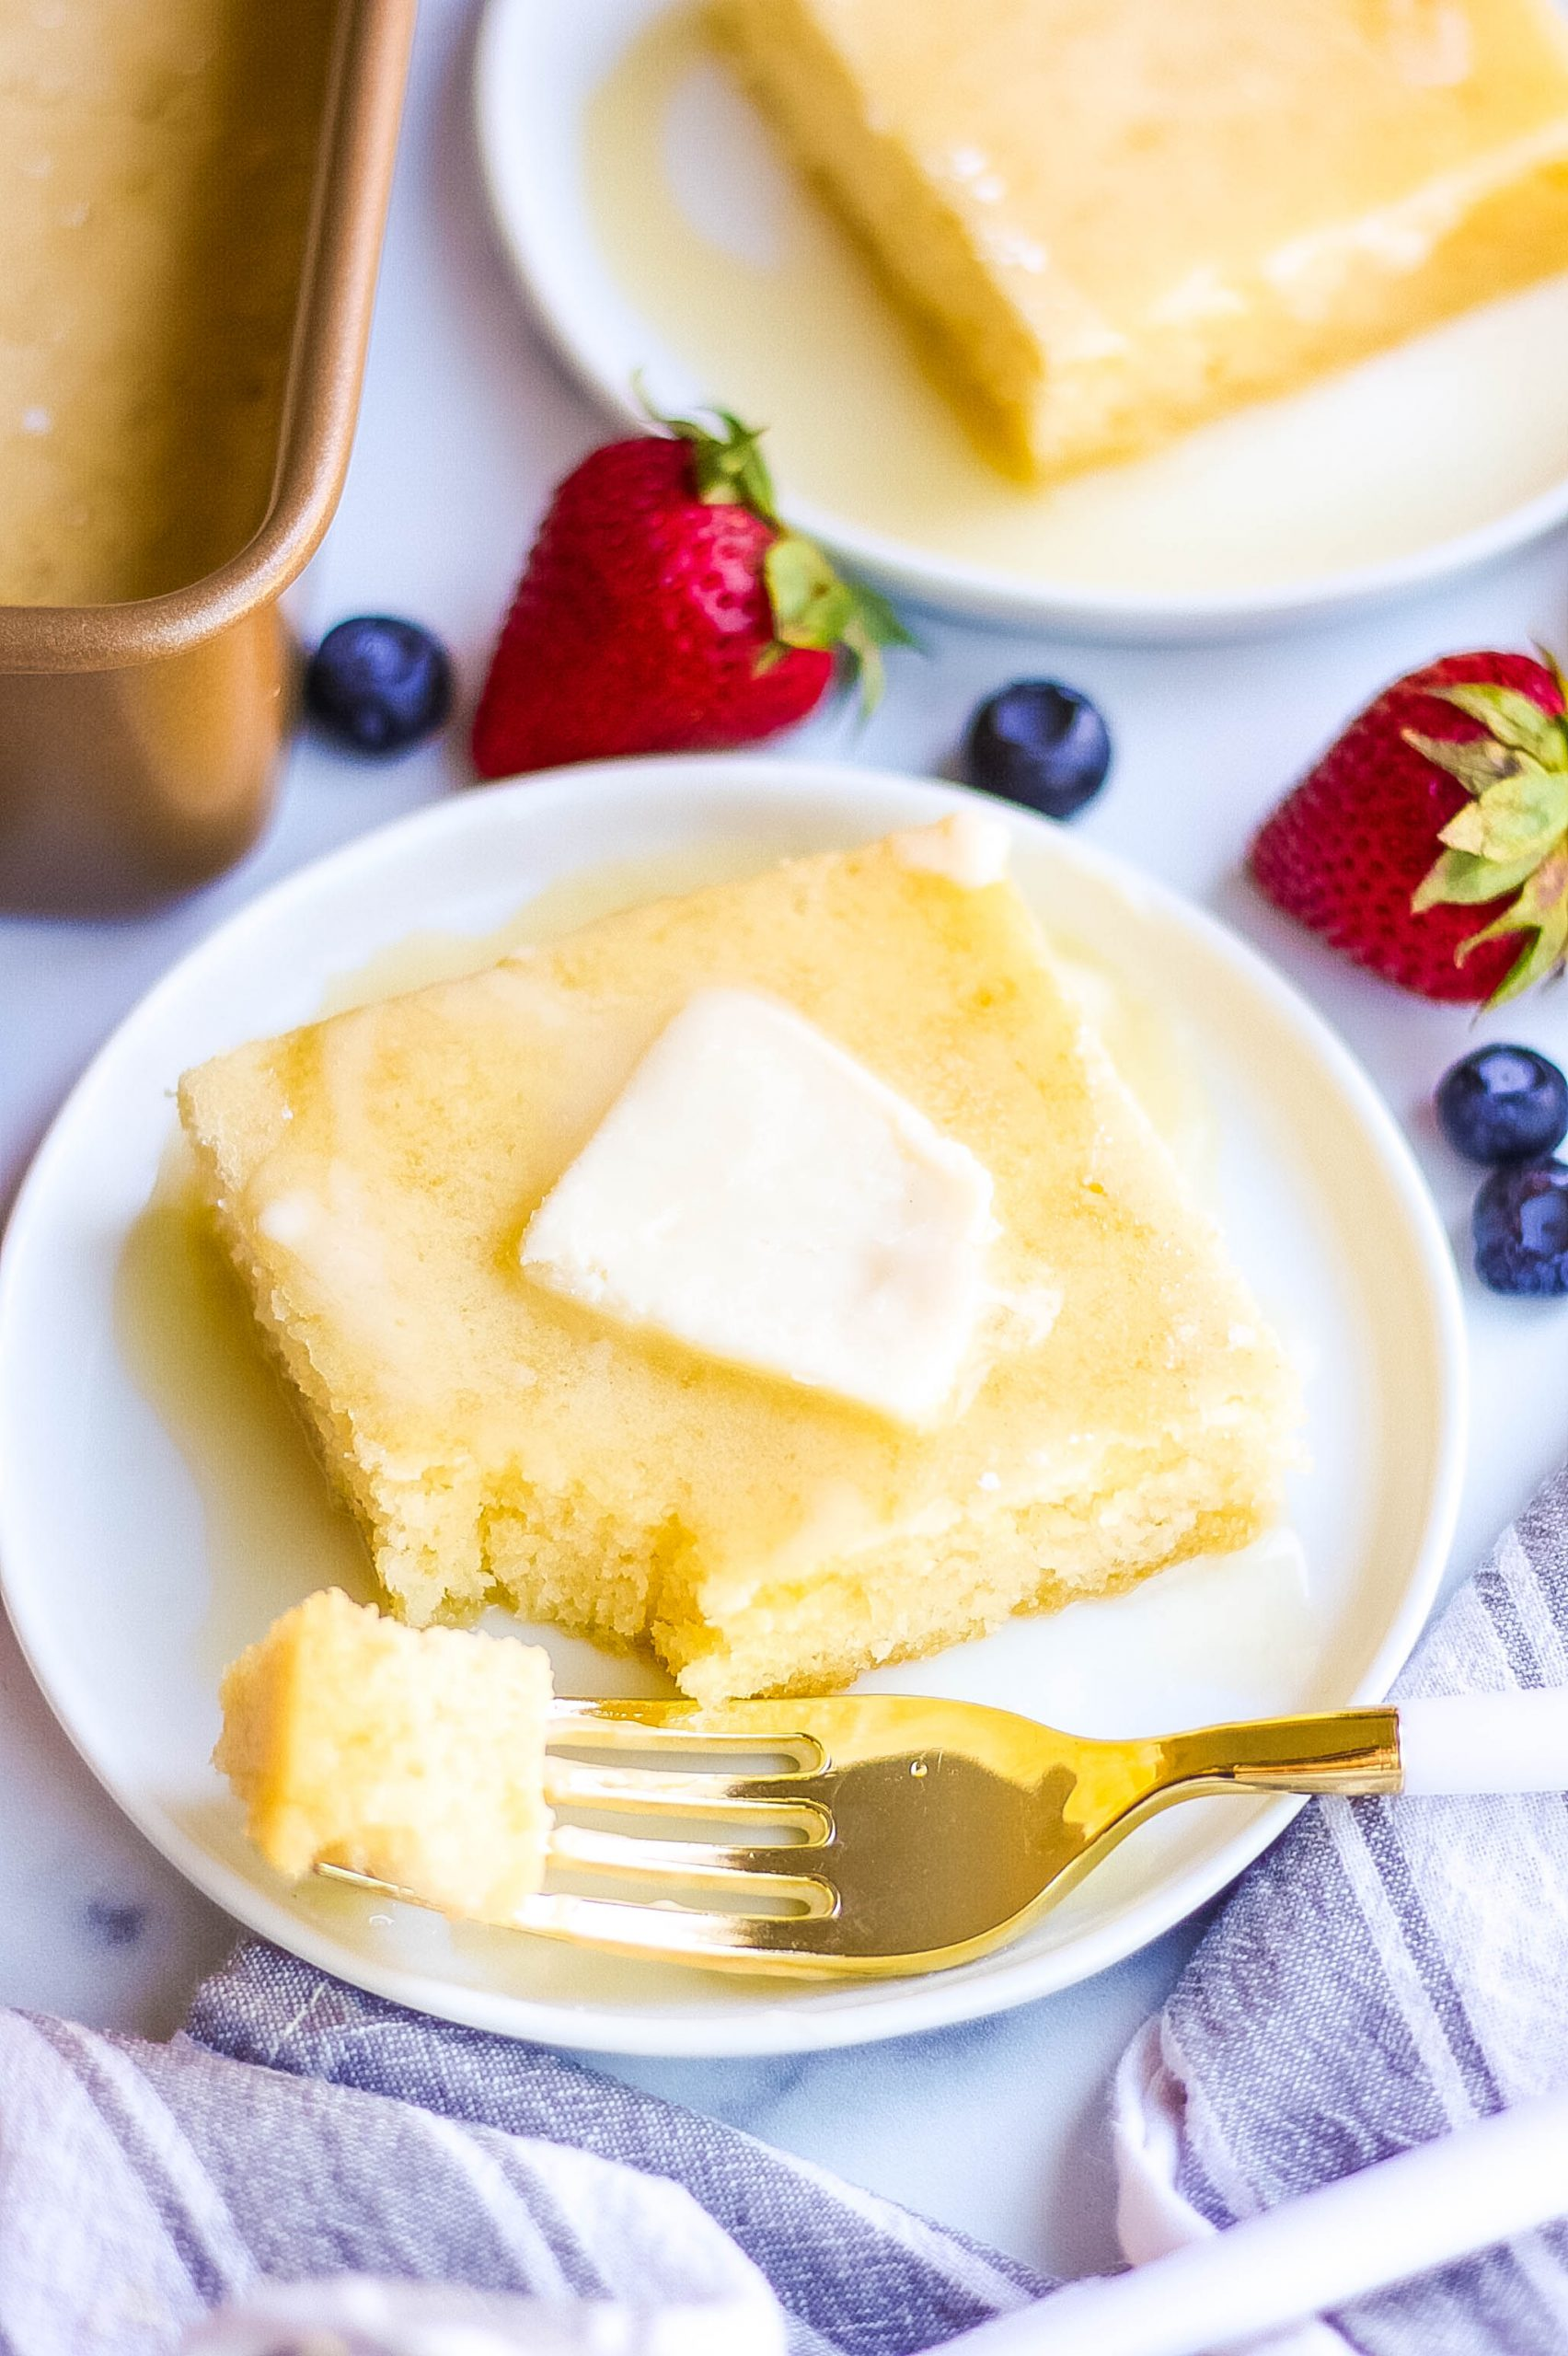 bite of baked pancakes